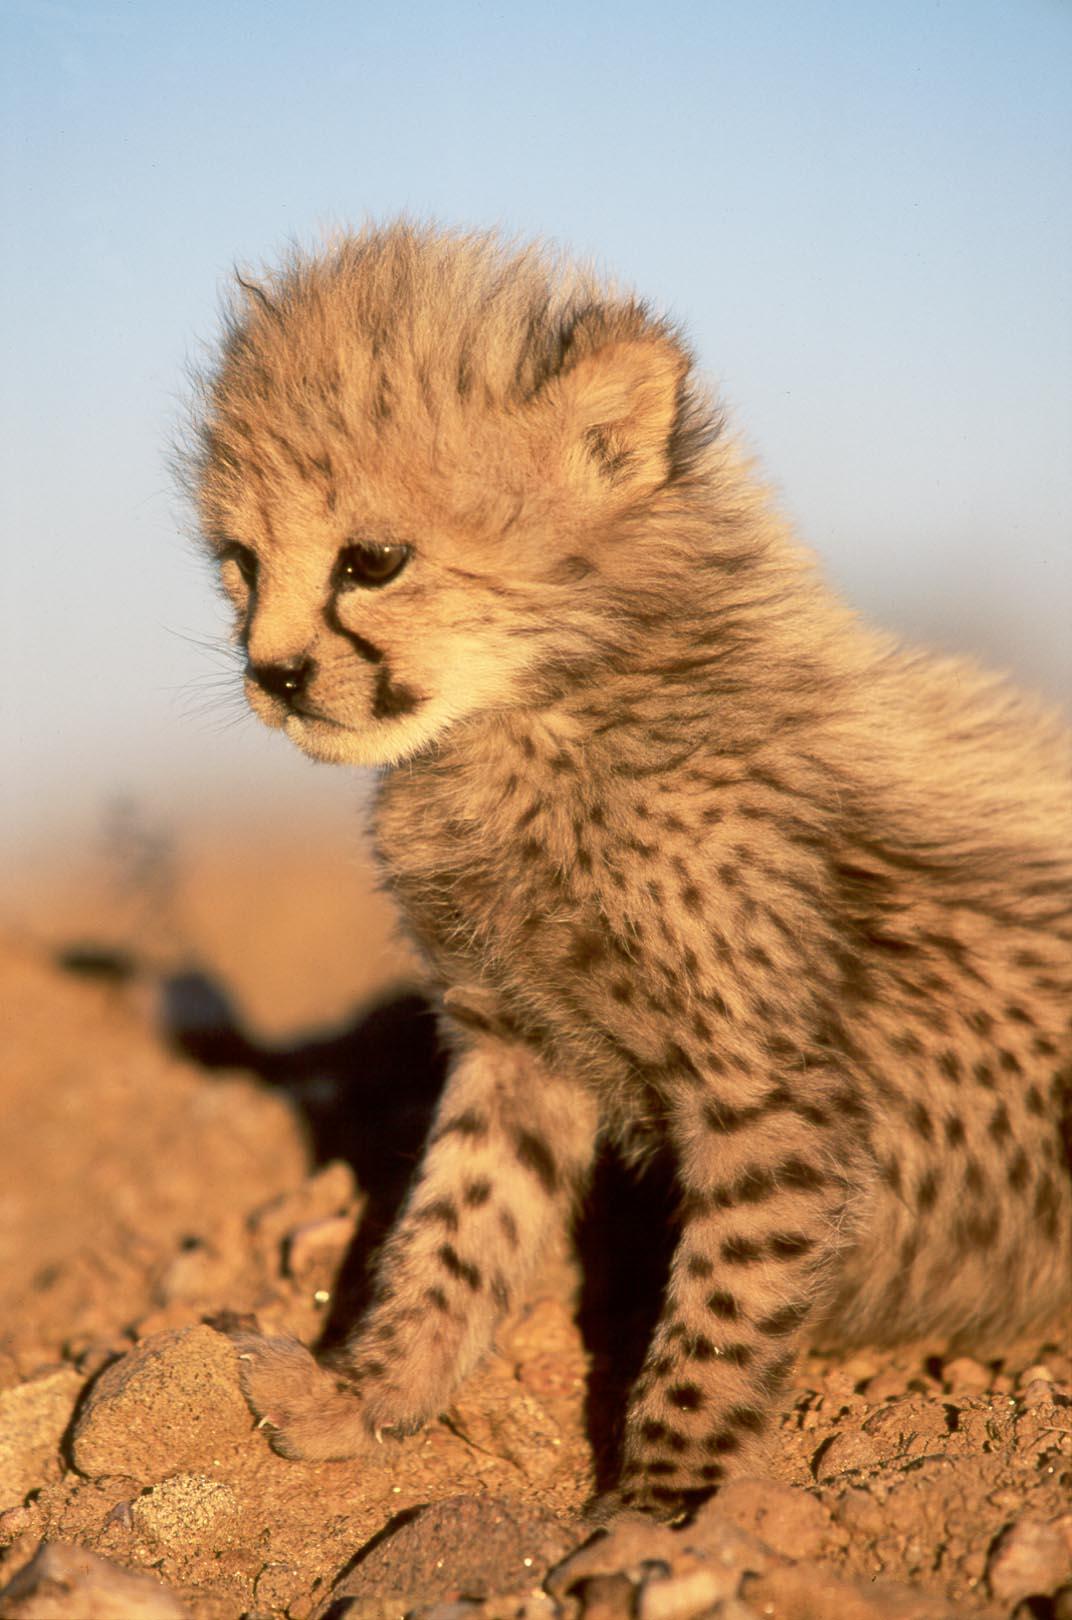 cheetah images cute cheetah cub hd wallpaper and background photos